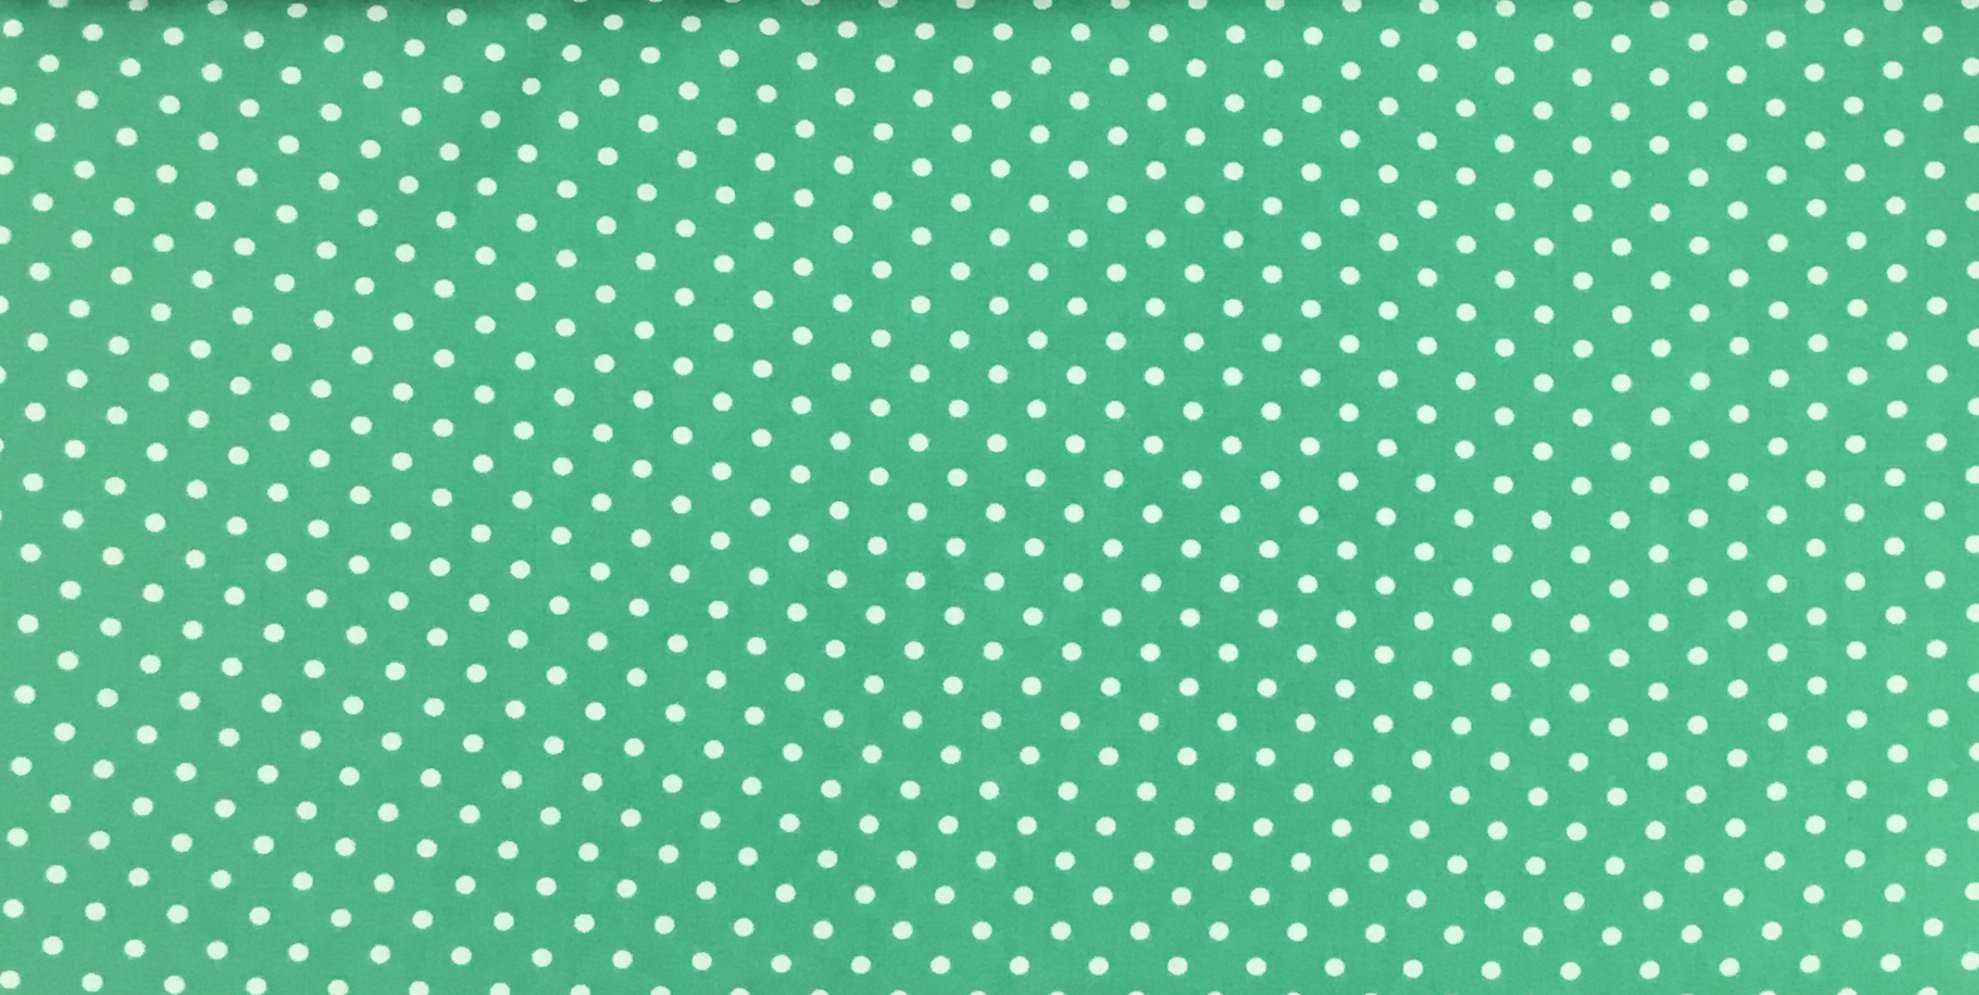 Adaman Coast - Green Day - White Dot